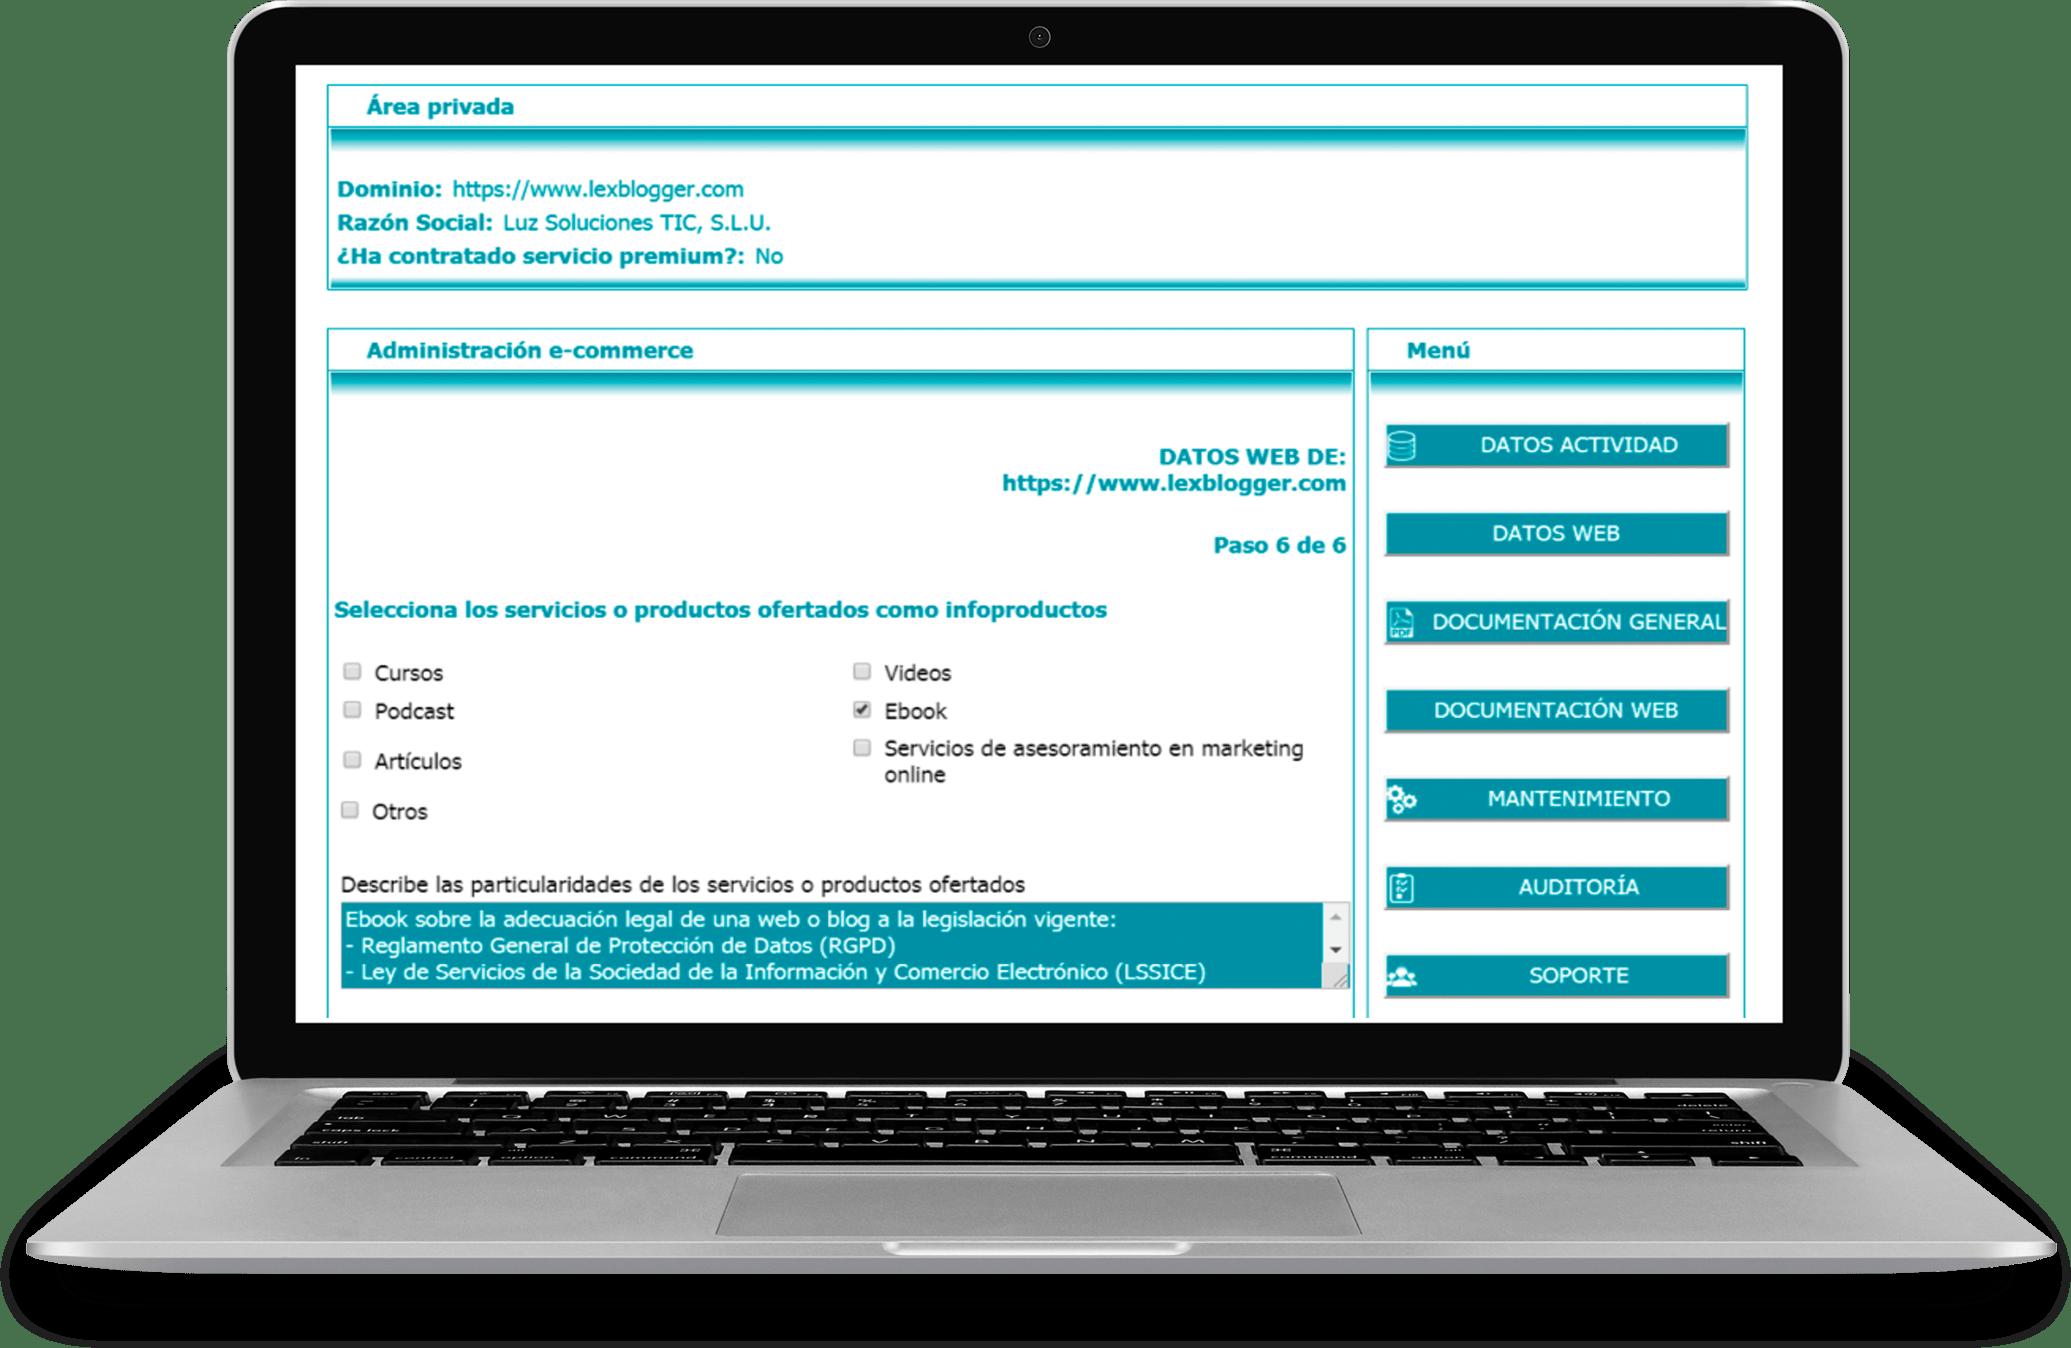 Pantalla Plus Infoproductos - LEXblogger